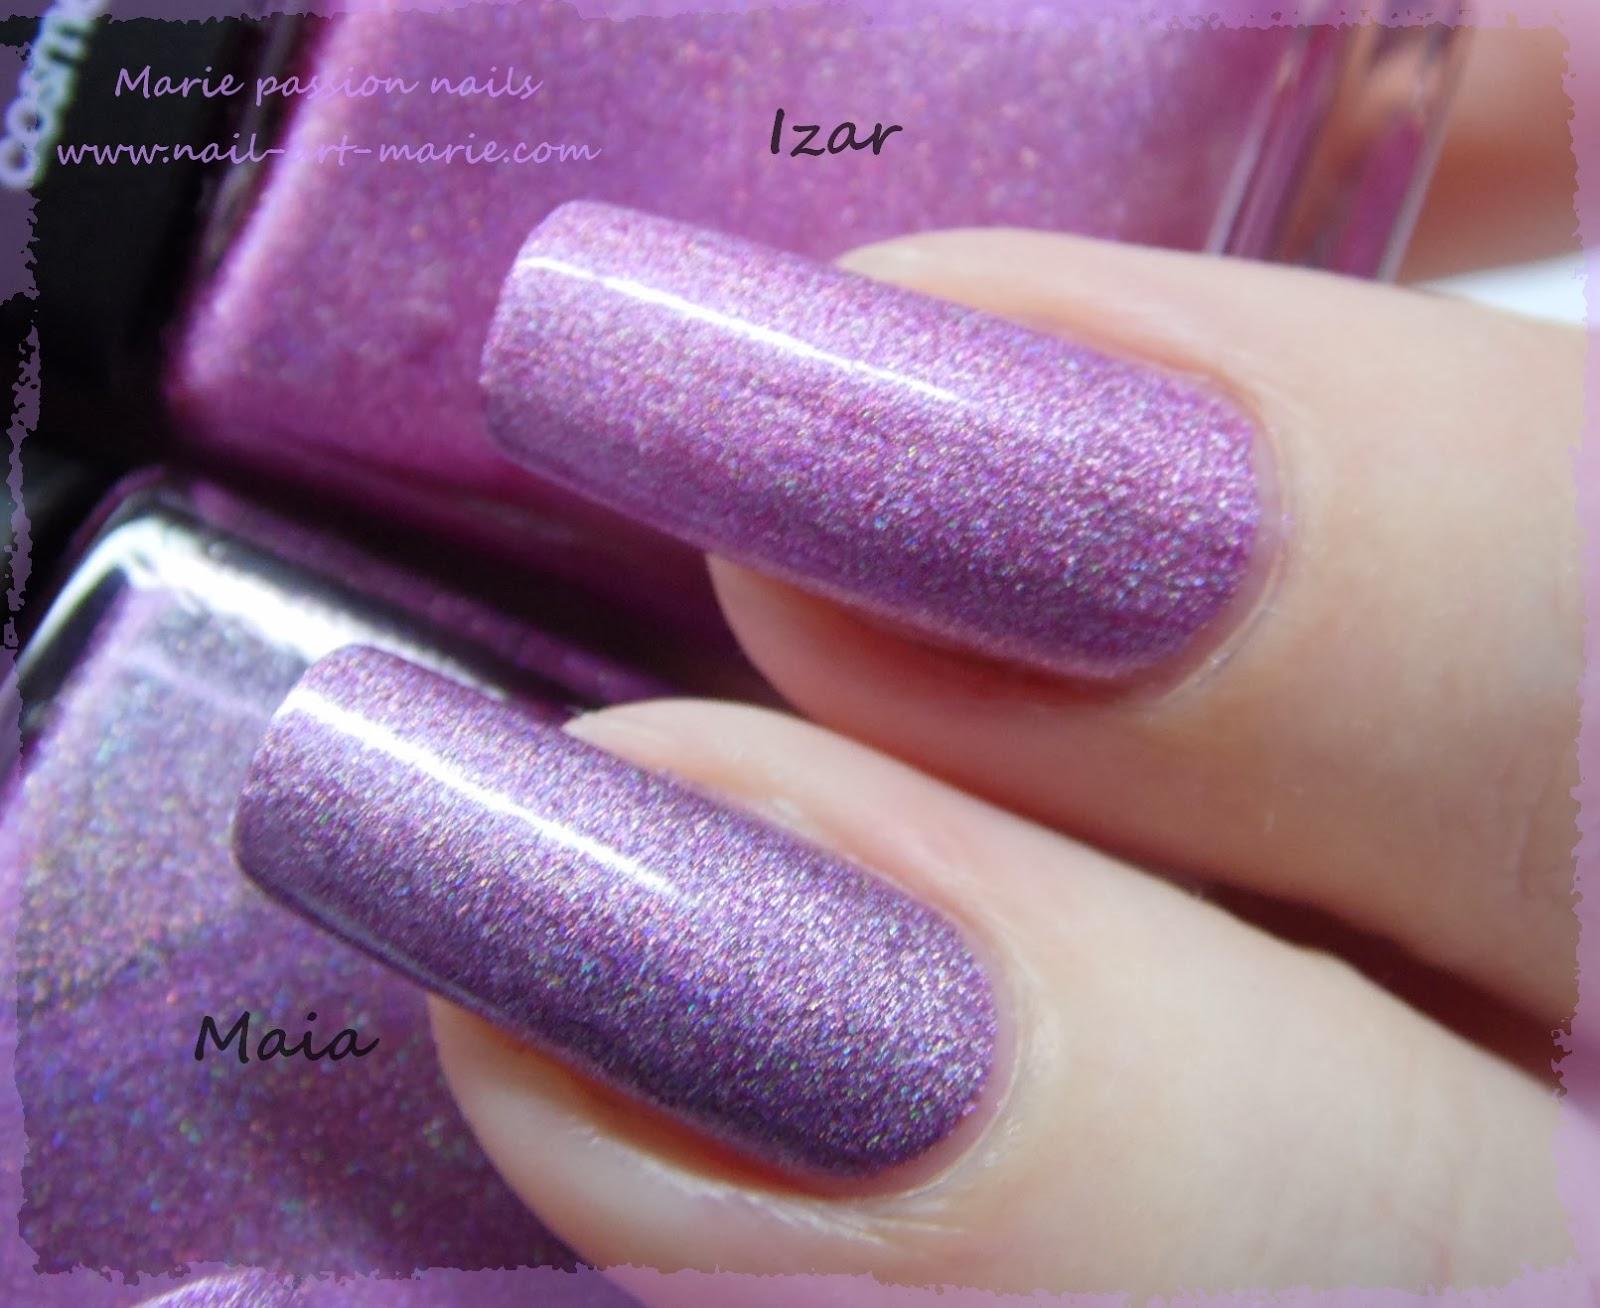 LM Cosmetic Izar et Maia3